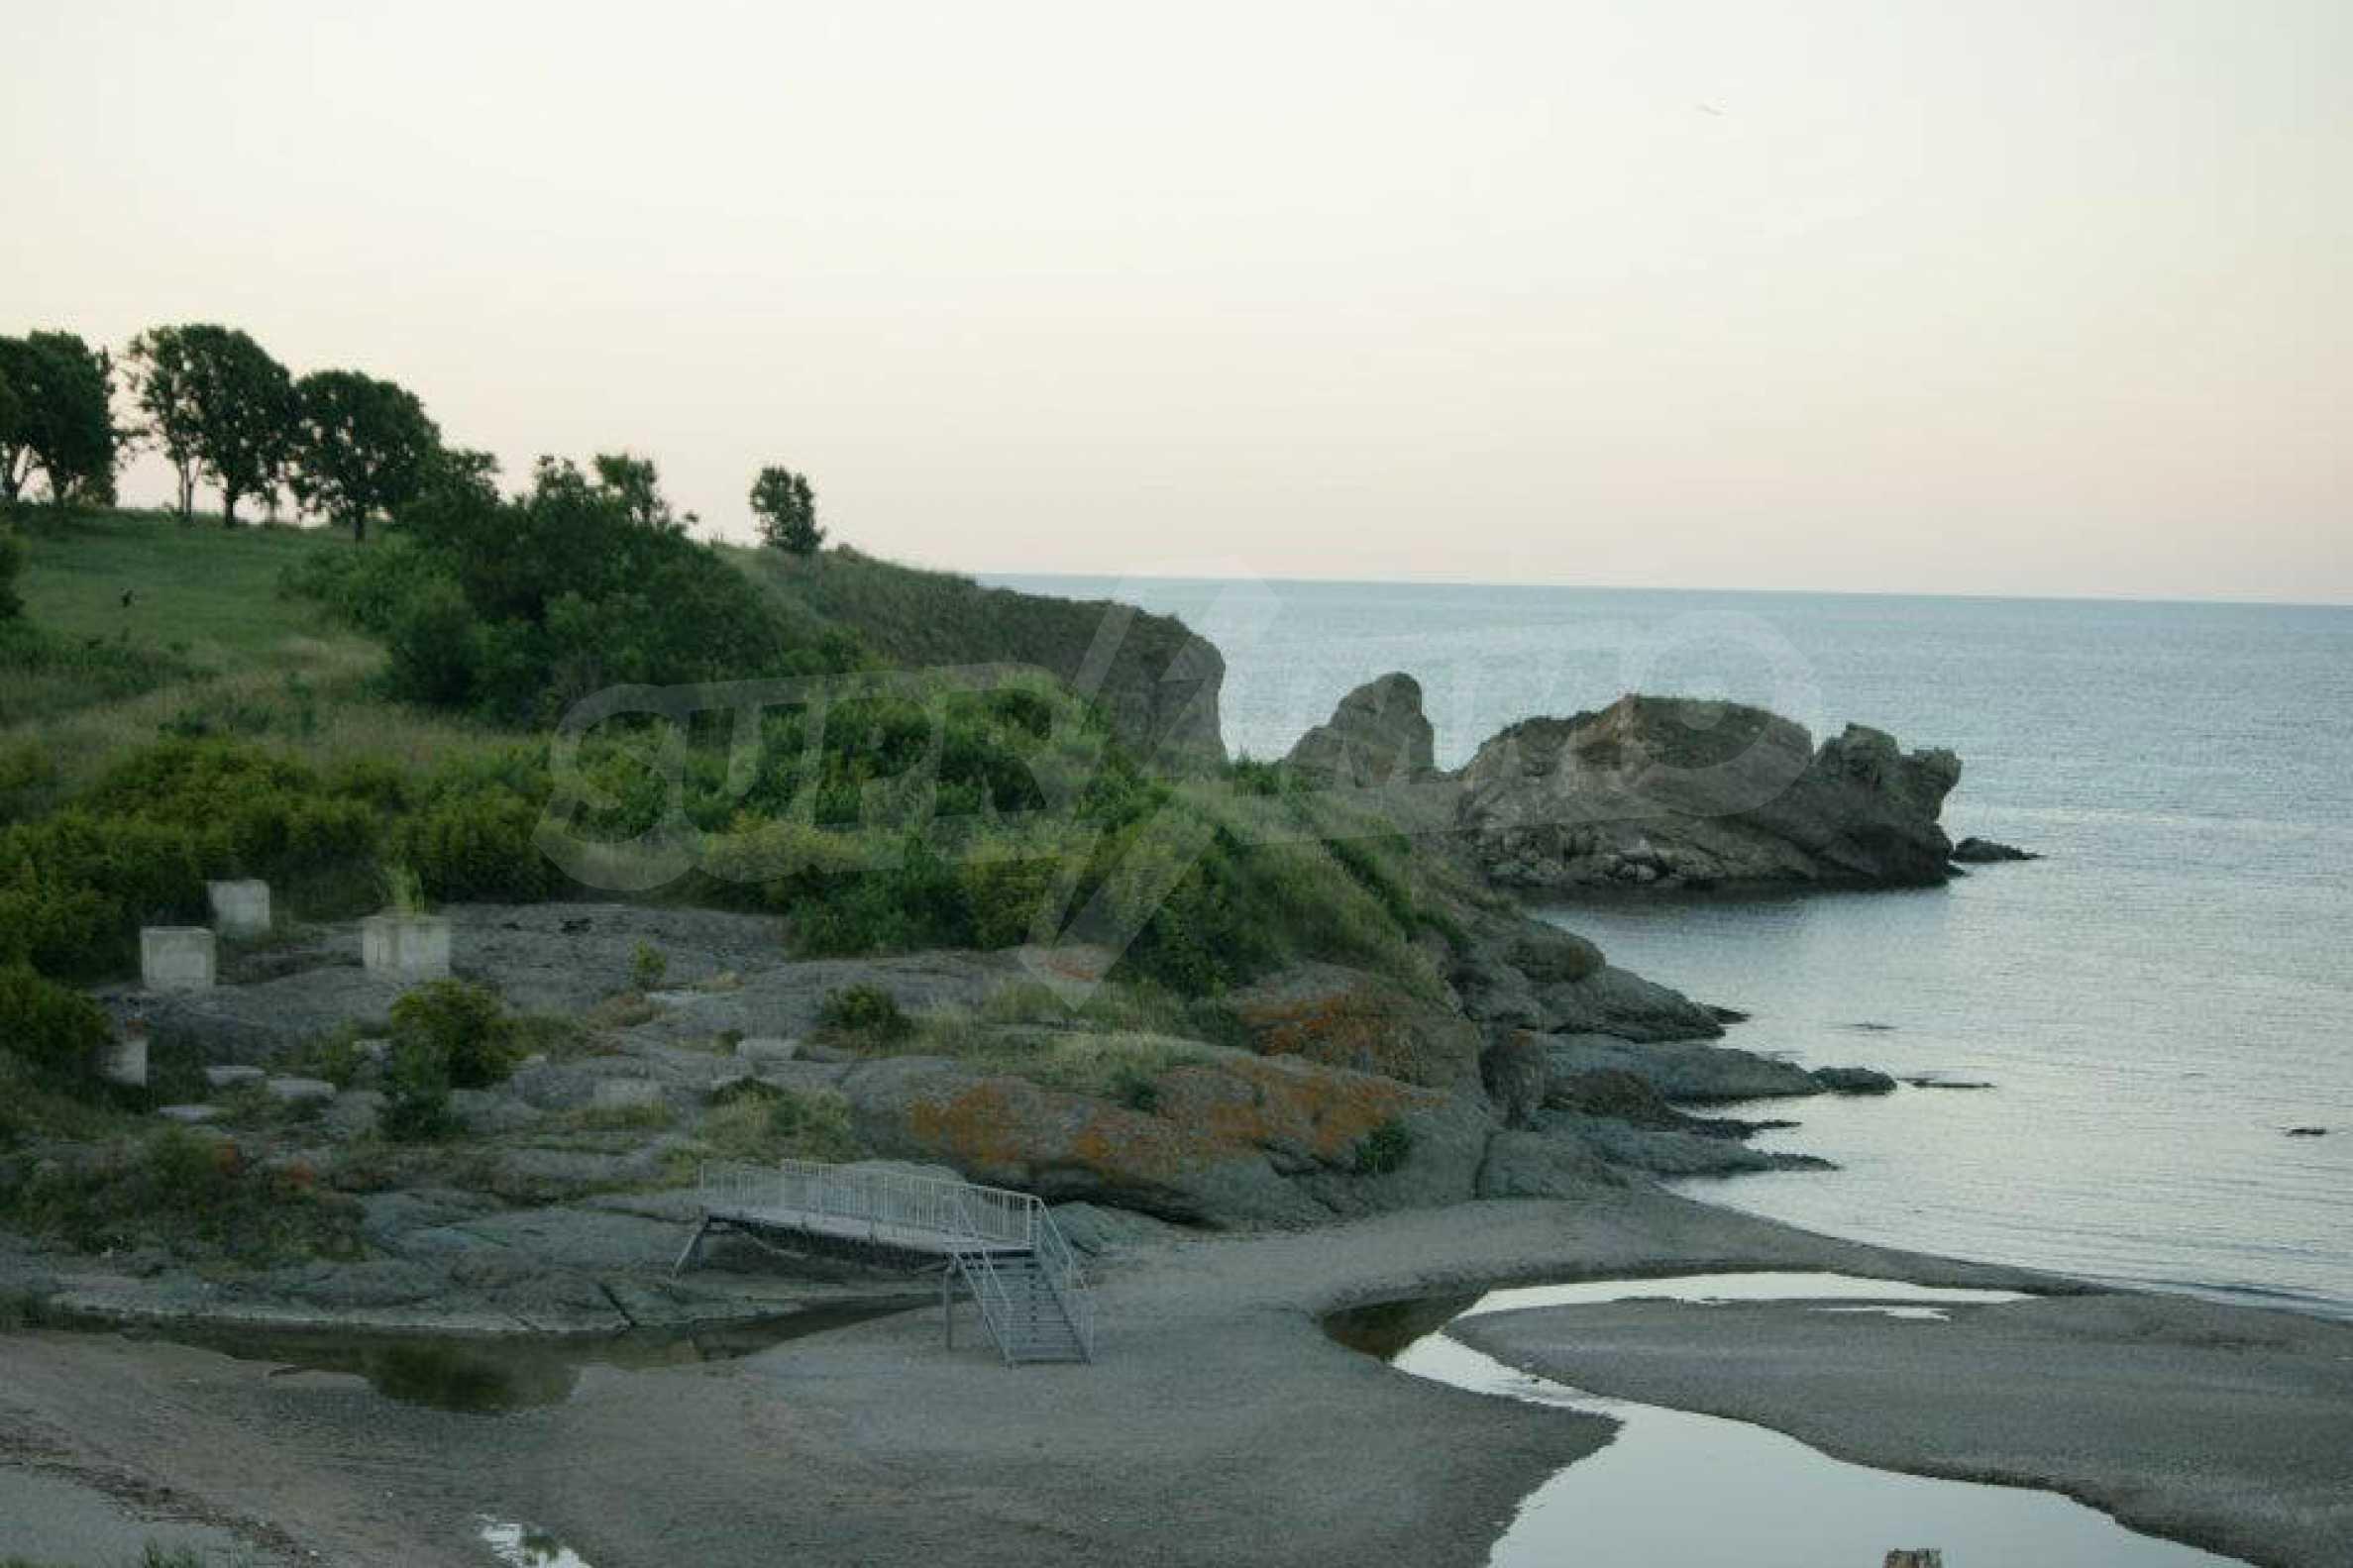 Примеа Бийч Резиденс / Primea Beach Residence 64